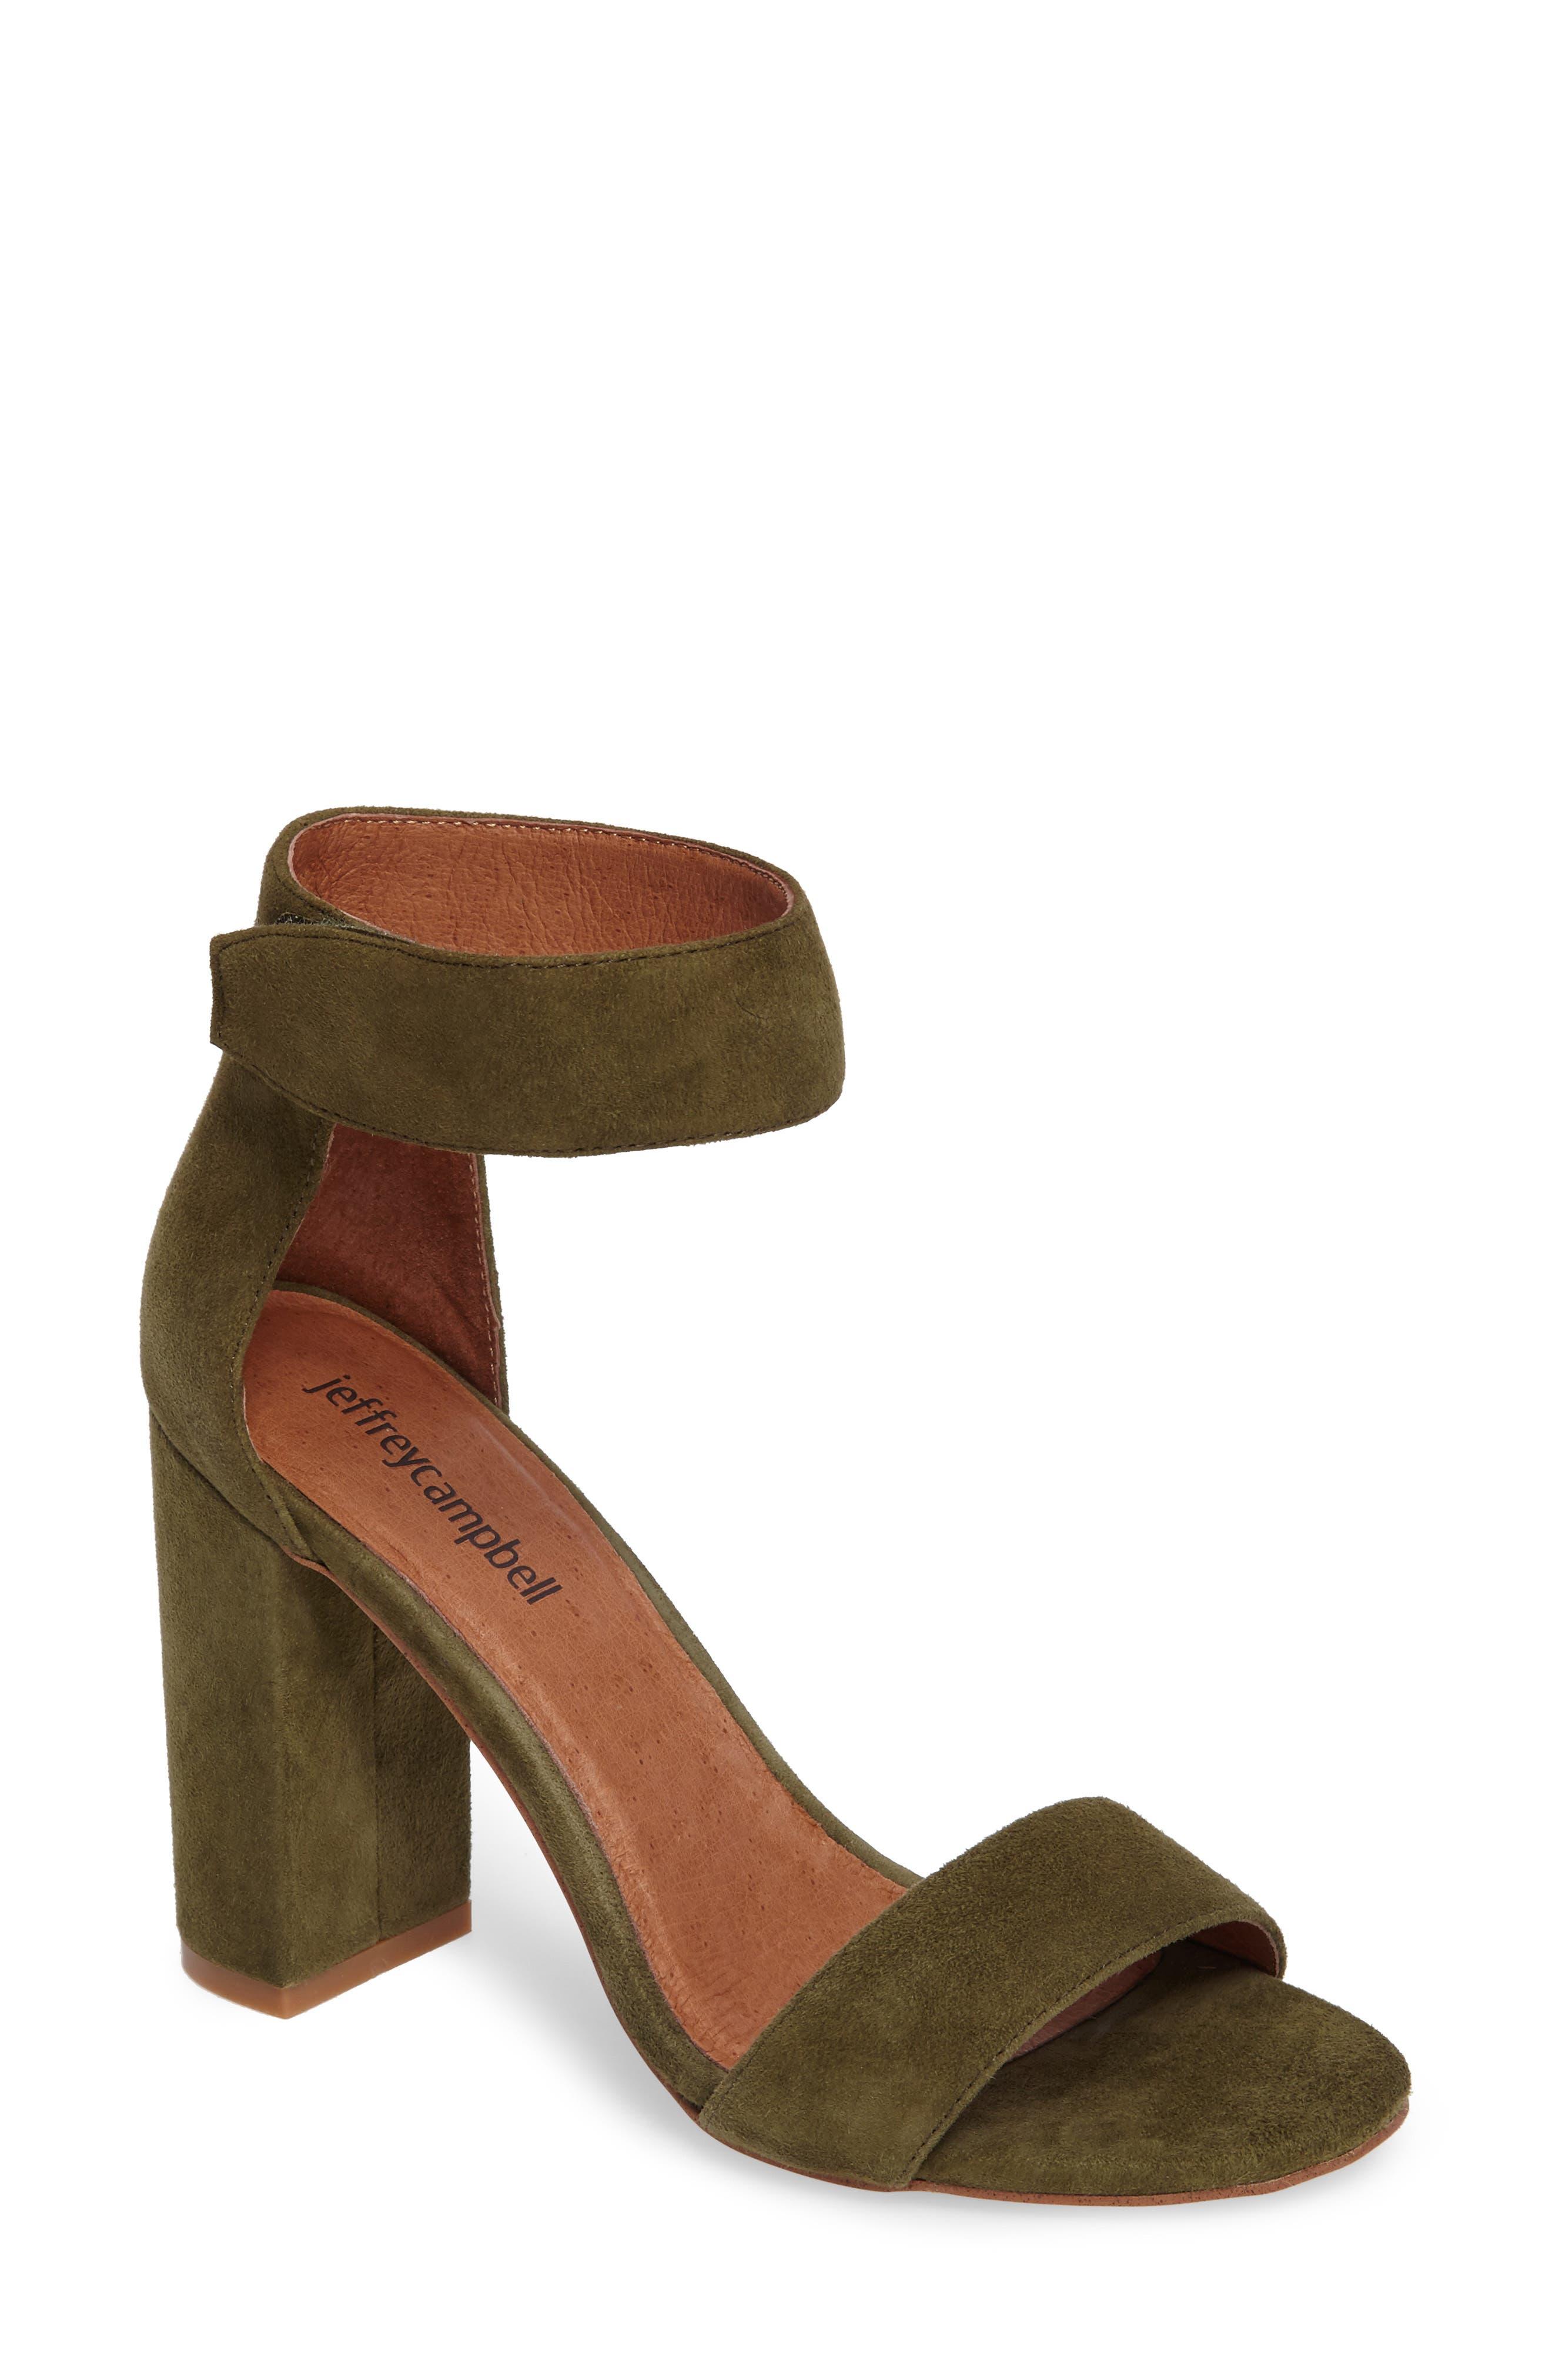 Main Image - Jeffrey Campbell 'Lindsay' Ankle Strap Sandal (Women)